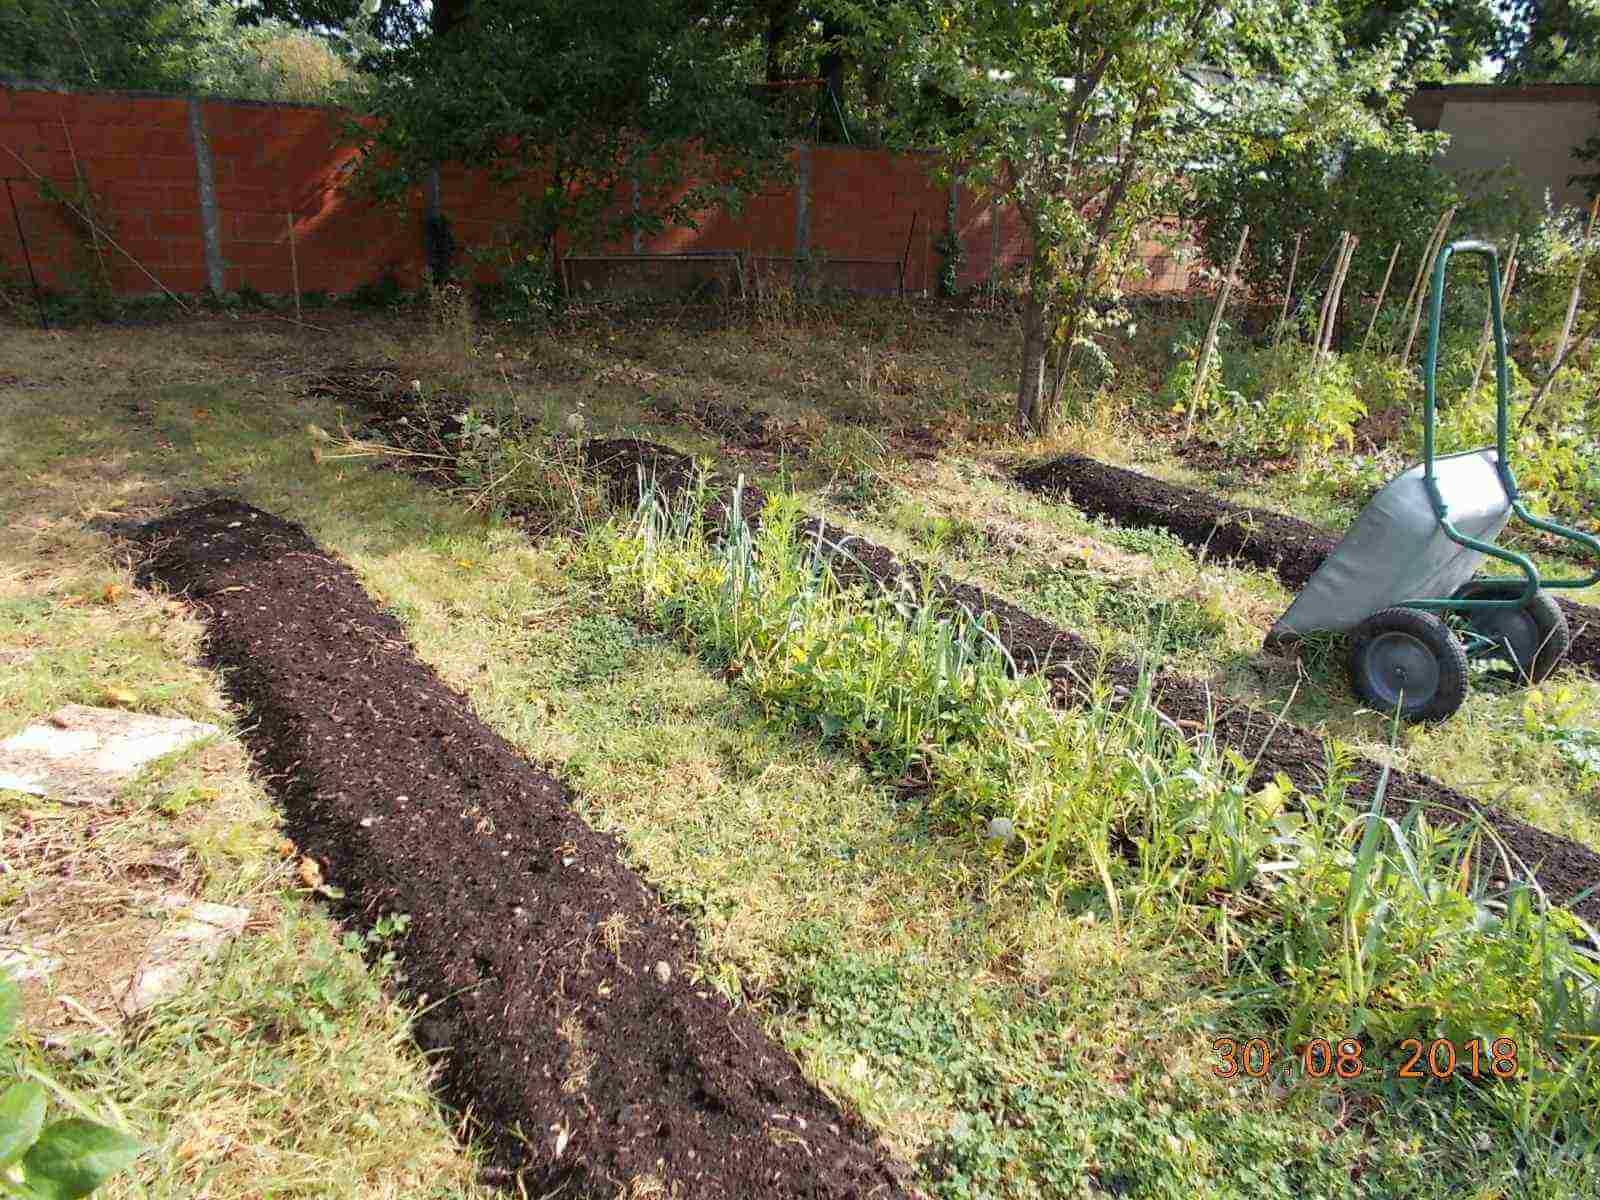 Analyse pollution jardin potager, arboretum permaculture